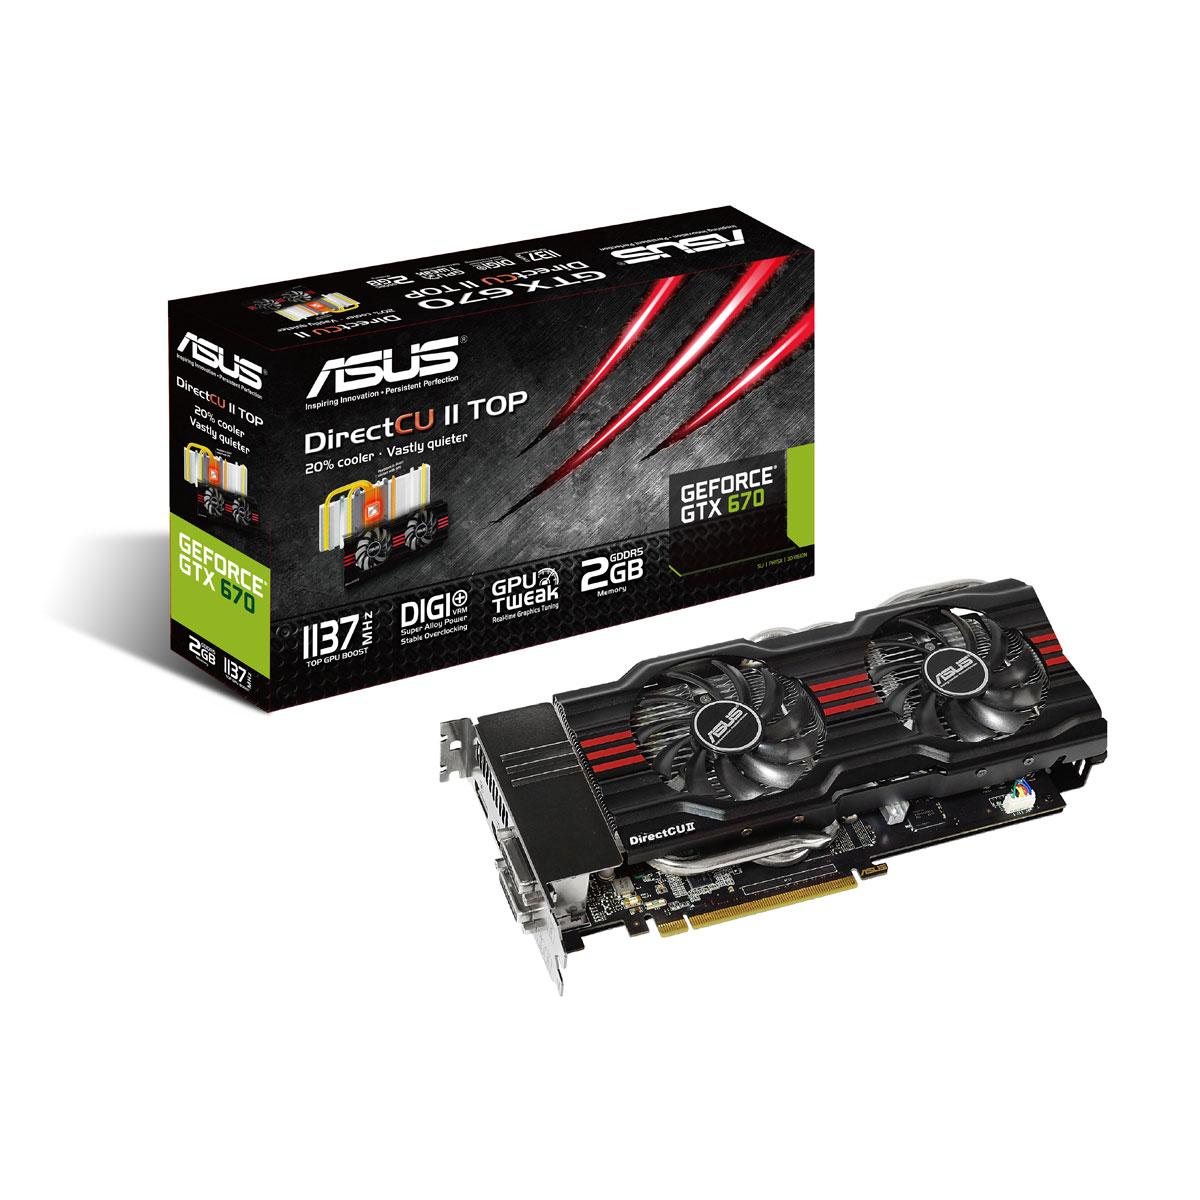 Carte graphique Asus GTX670-DC2T-2GD5 2 GB 2048 Mo Dual DVI/HDMI/DisplayPort - PCI Express (NVIDIA GeForce avec CUDA GTX 670)